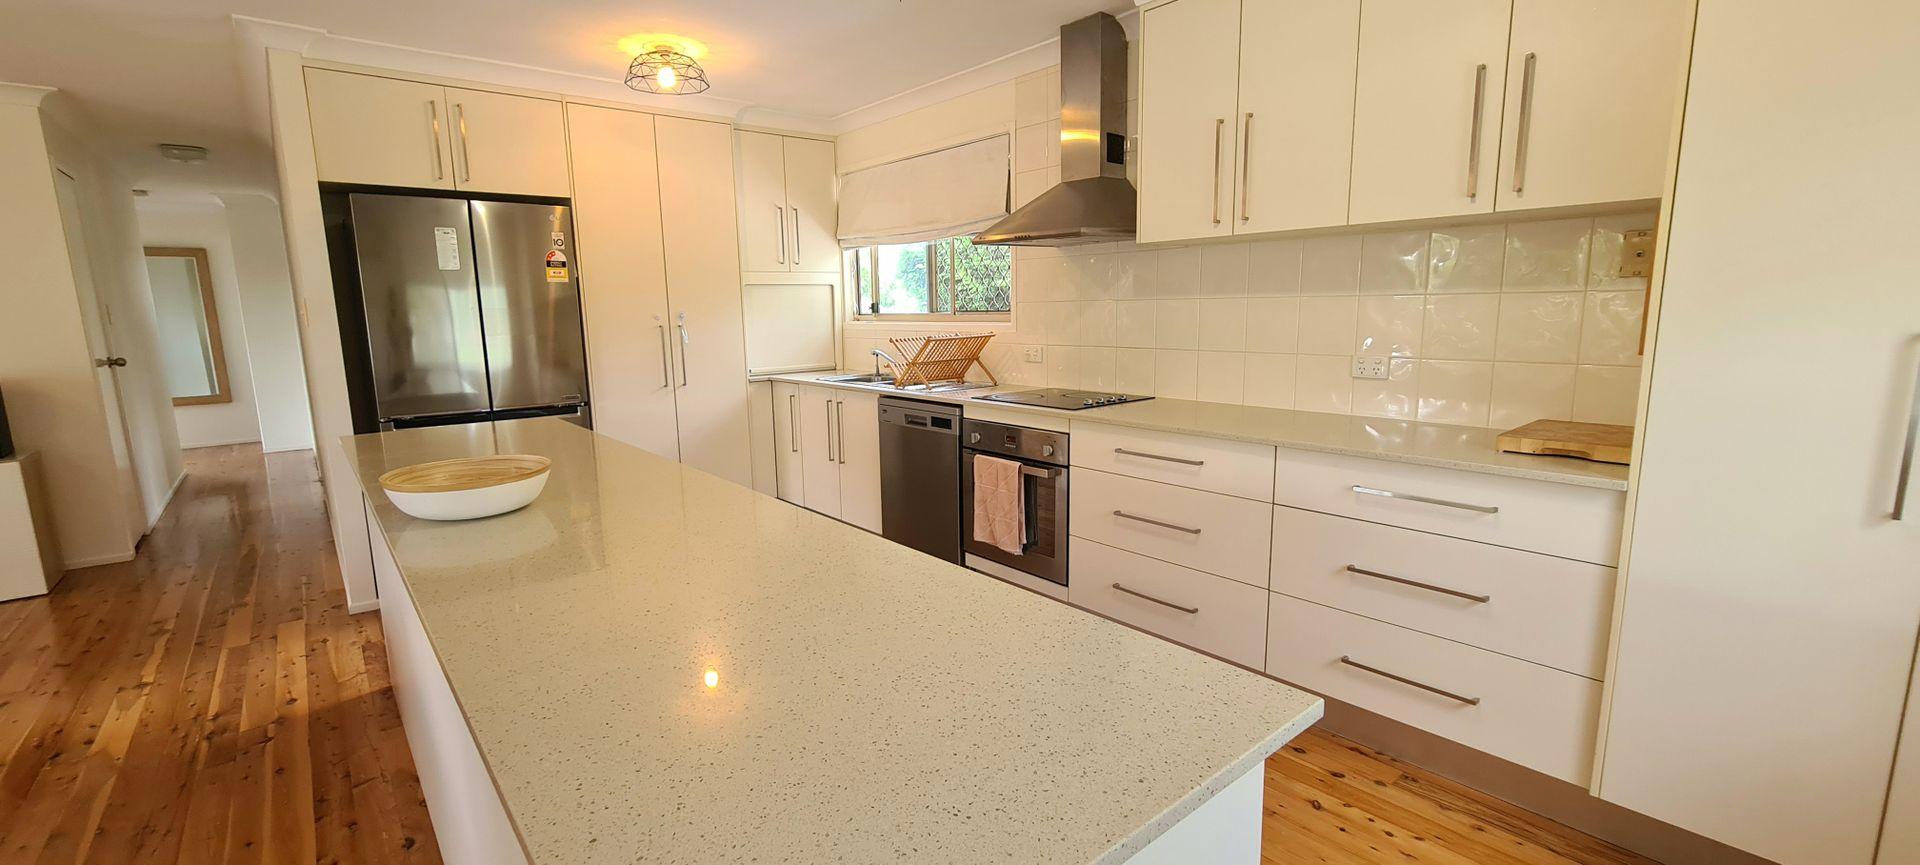 48 Royston Street, Kilcoy QLD 4515, Image 1